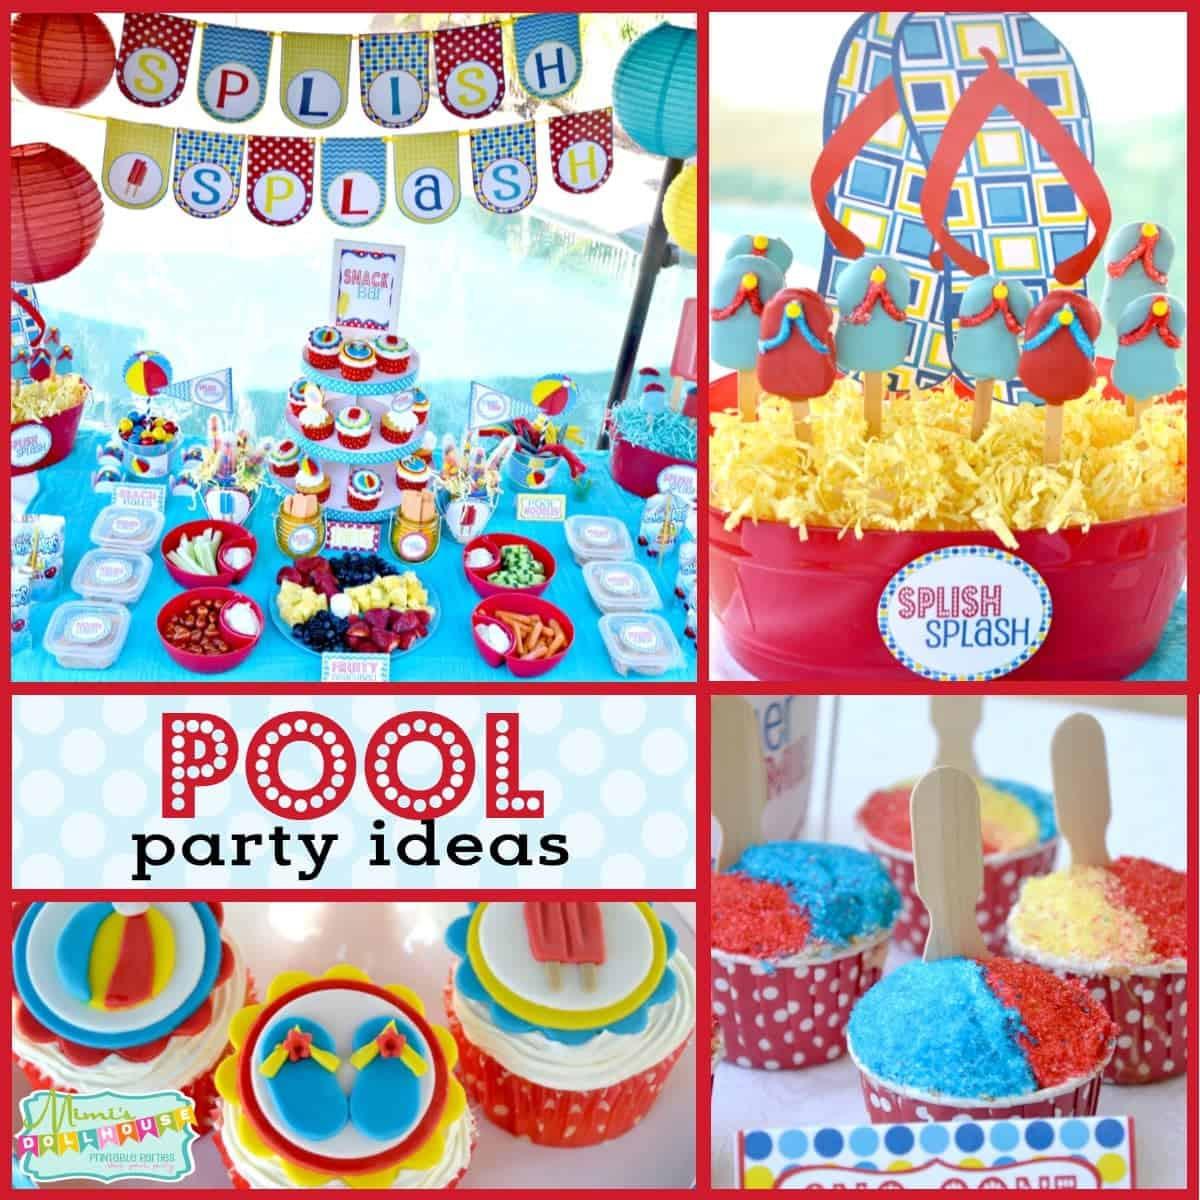 Ideas Pool Party  Pool Party Splish Splash School s Out Party Mimi s